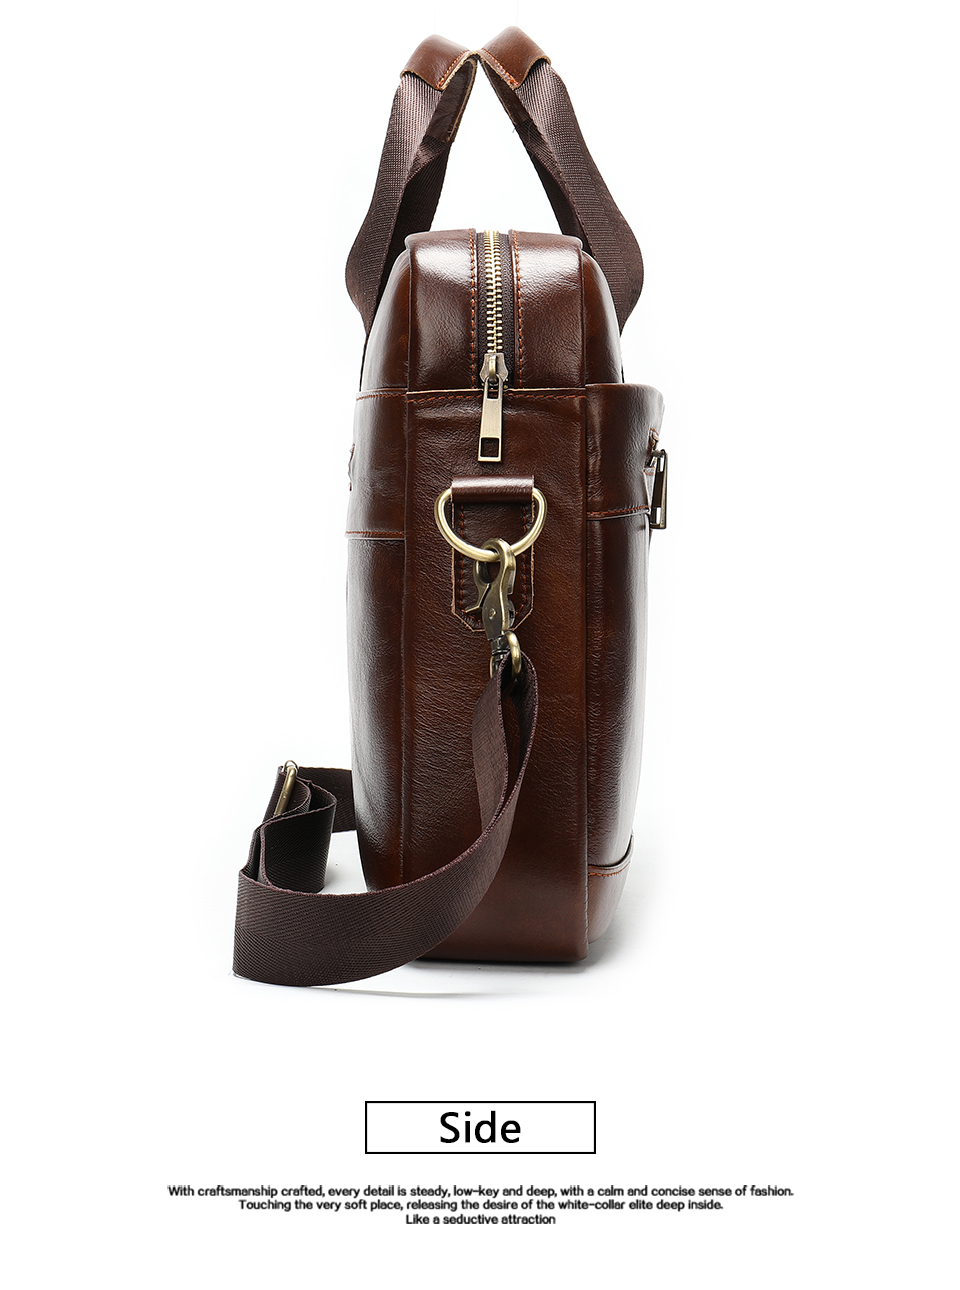 9 Bag Men's Genuine Leather Briefcase Male Handbags Lawyer Man Laptop Bag Leather for Men Messenger Bags Men's Briefcases